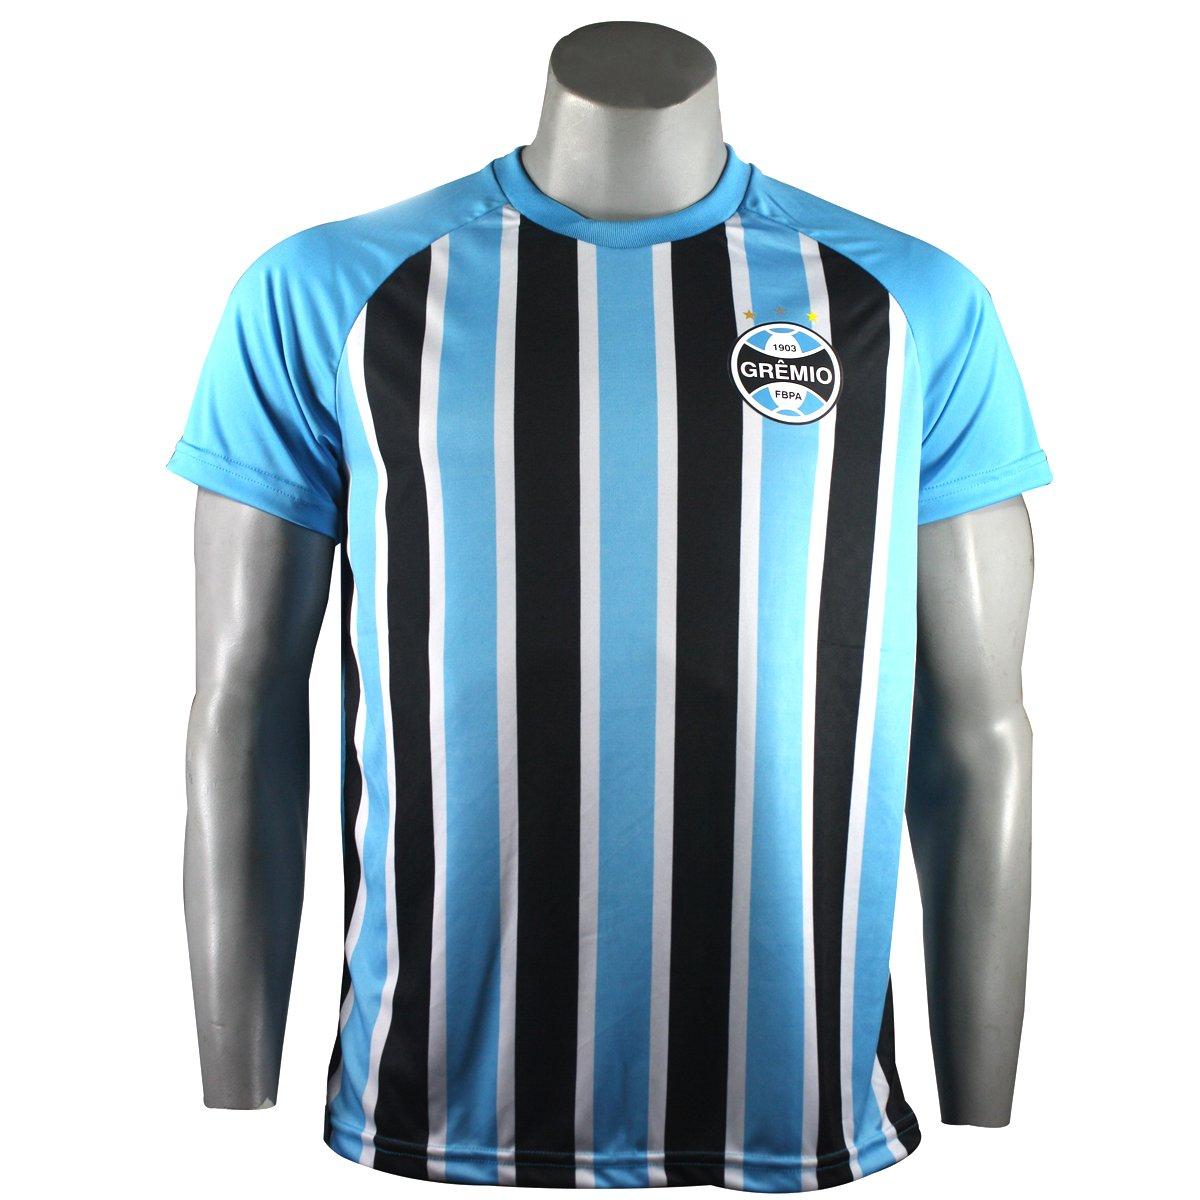 Camiseta Masculina Grêmio Stripes Poa NC18007 - Azul Tricolor ... bdb4c4bf36c86